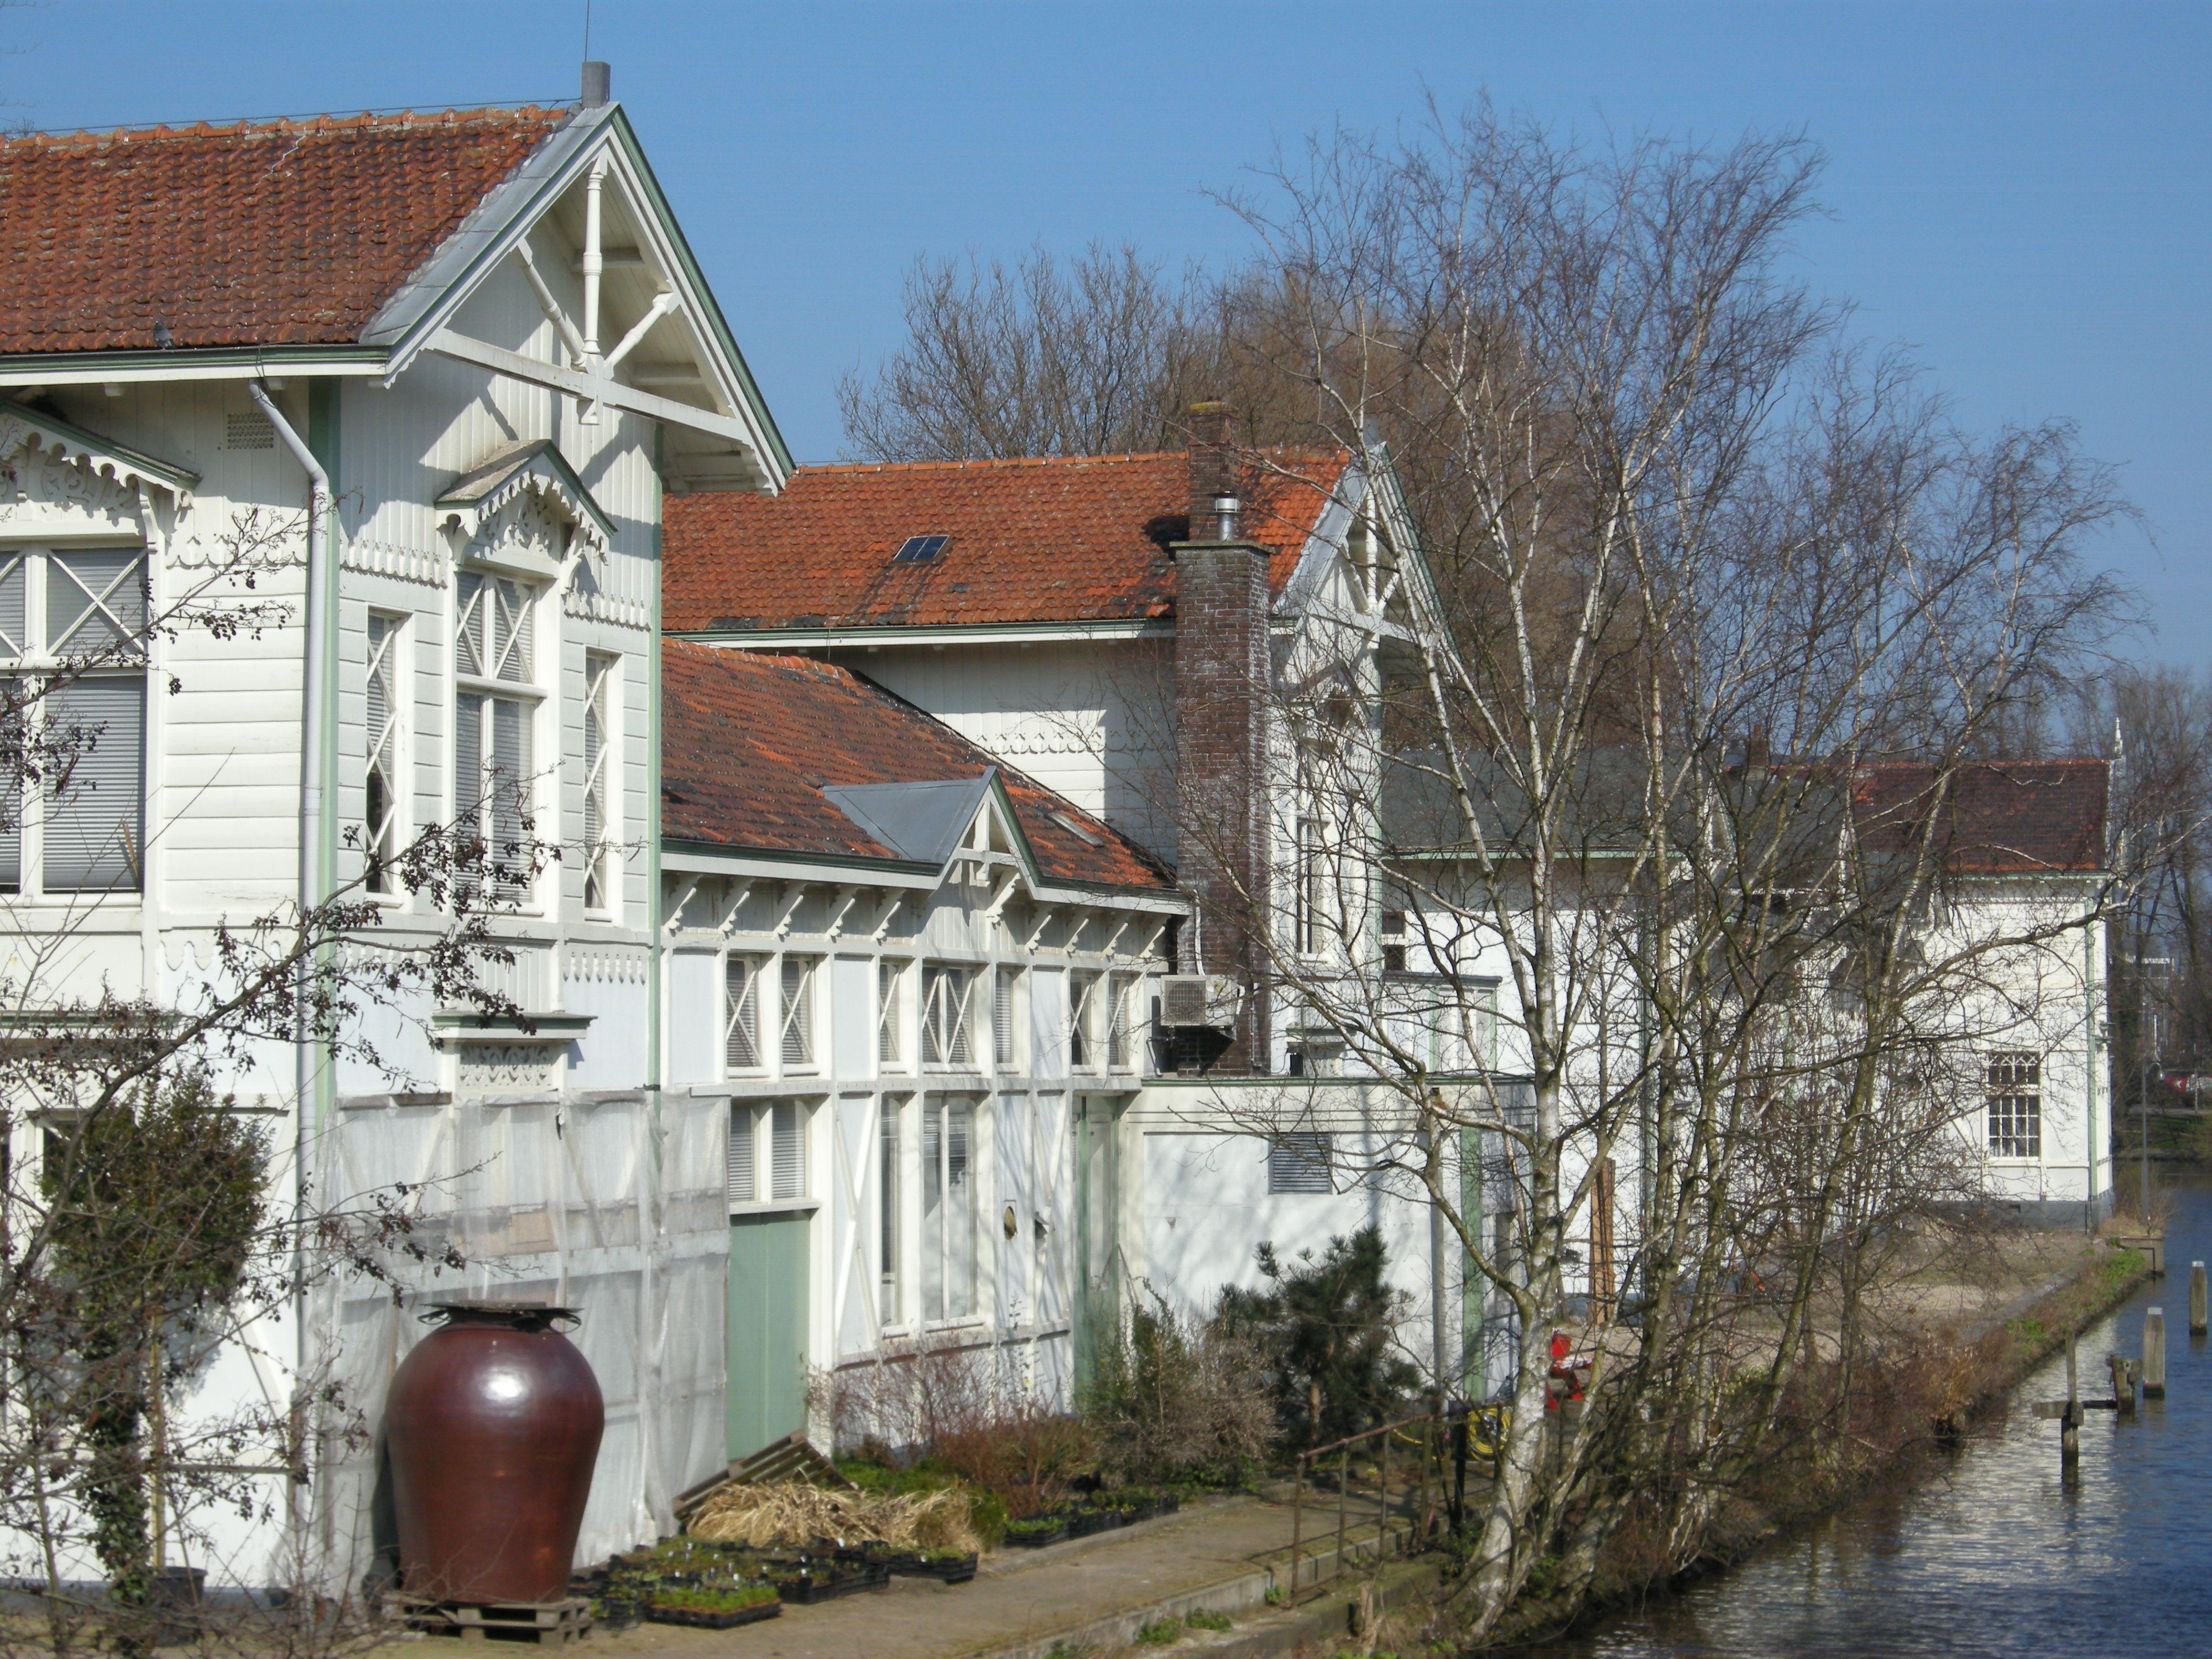 beautiful old white houses,  Artis (zoo), Plantage Middenlaan, Amsterdam